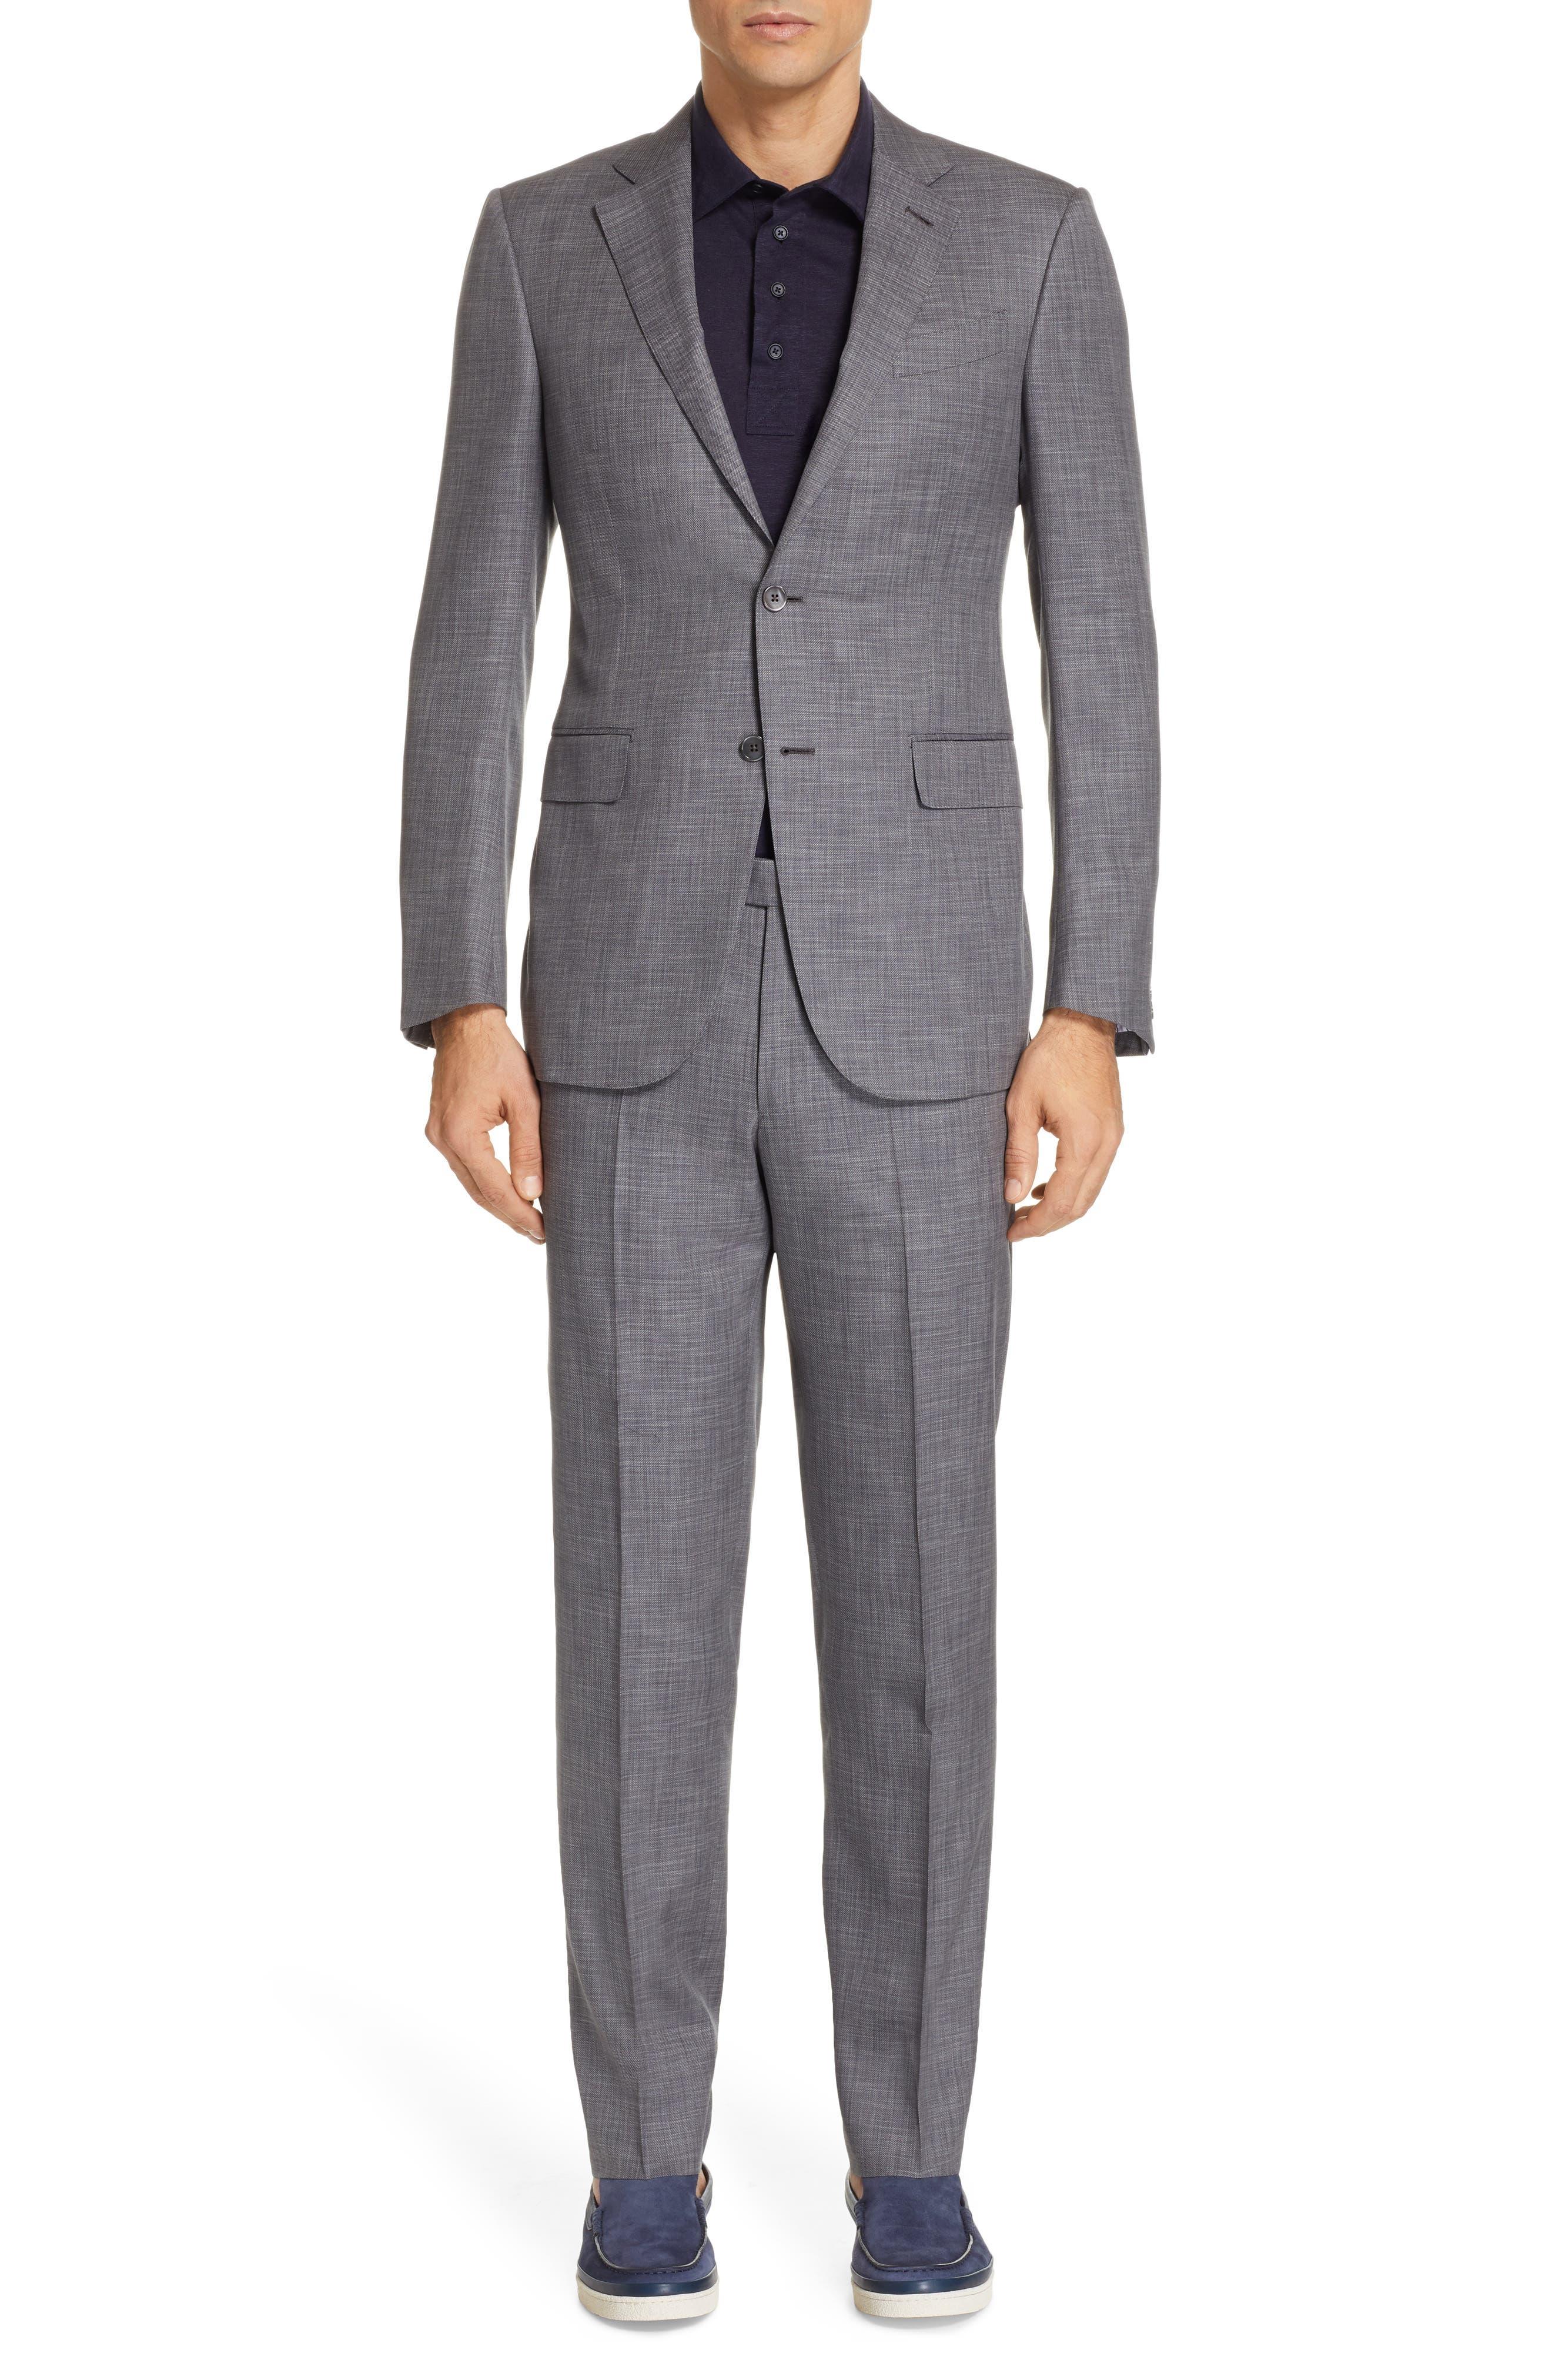 ERMENEGILDO ZEGNA, Milano Trim Fit Solid Wool & Silk Suit, Main thumbnail 1, color, GREY